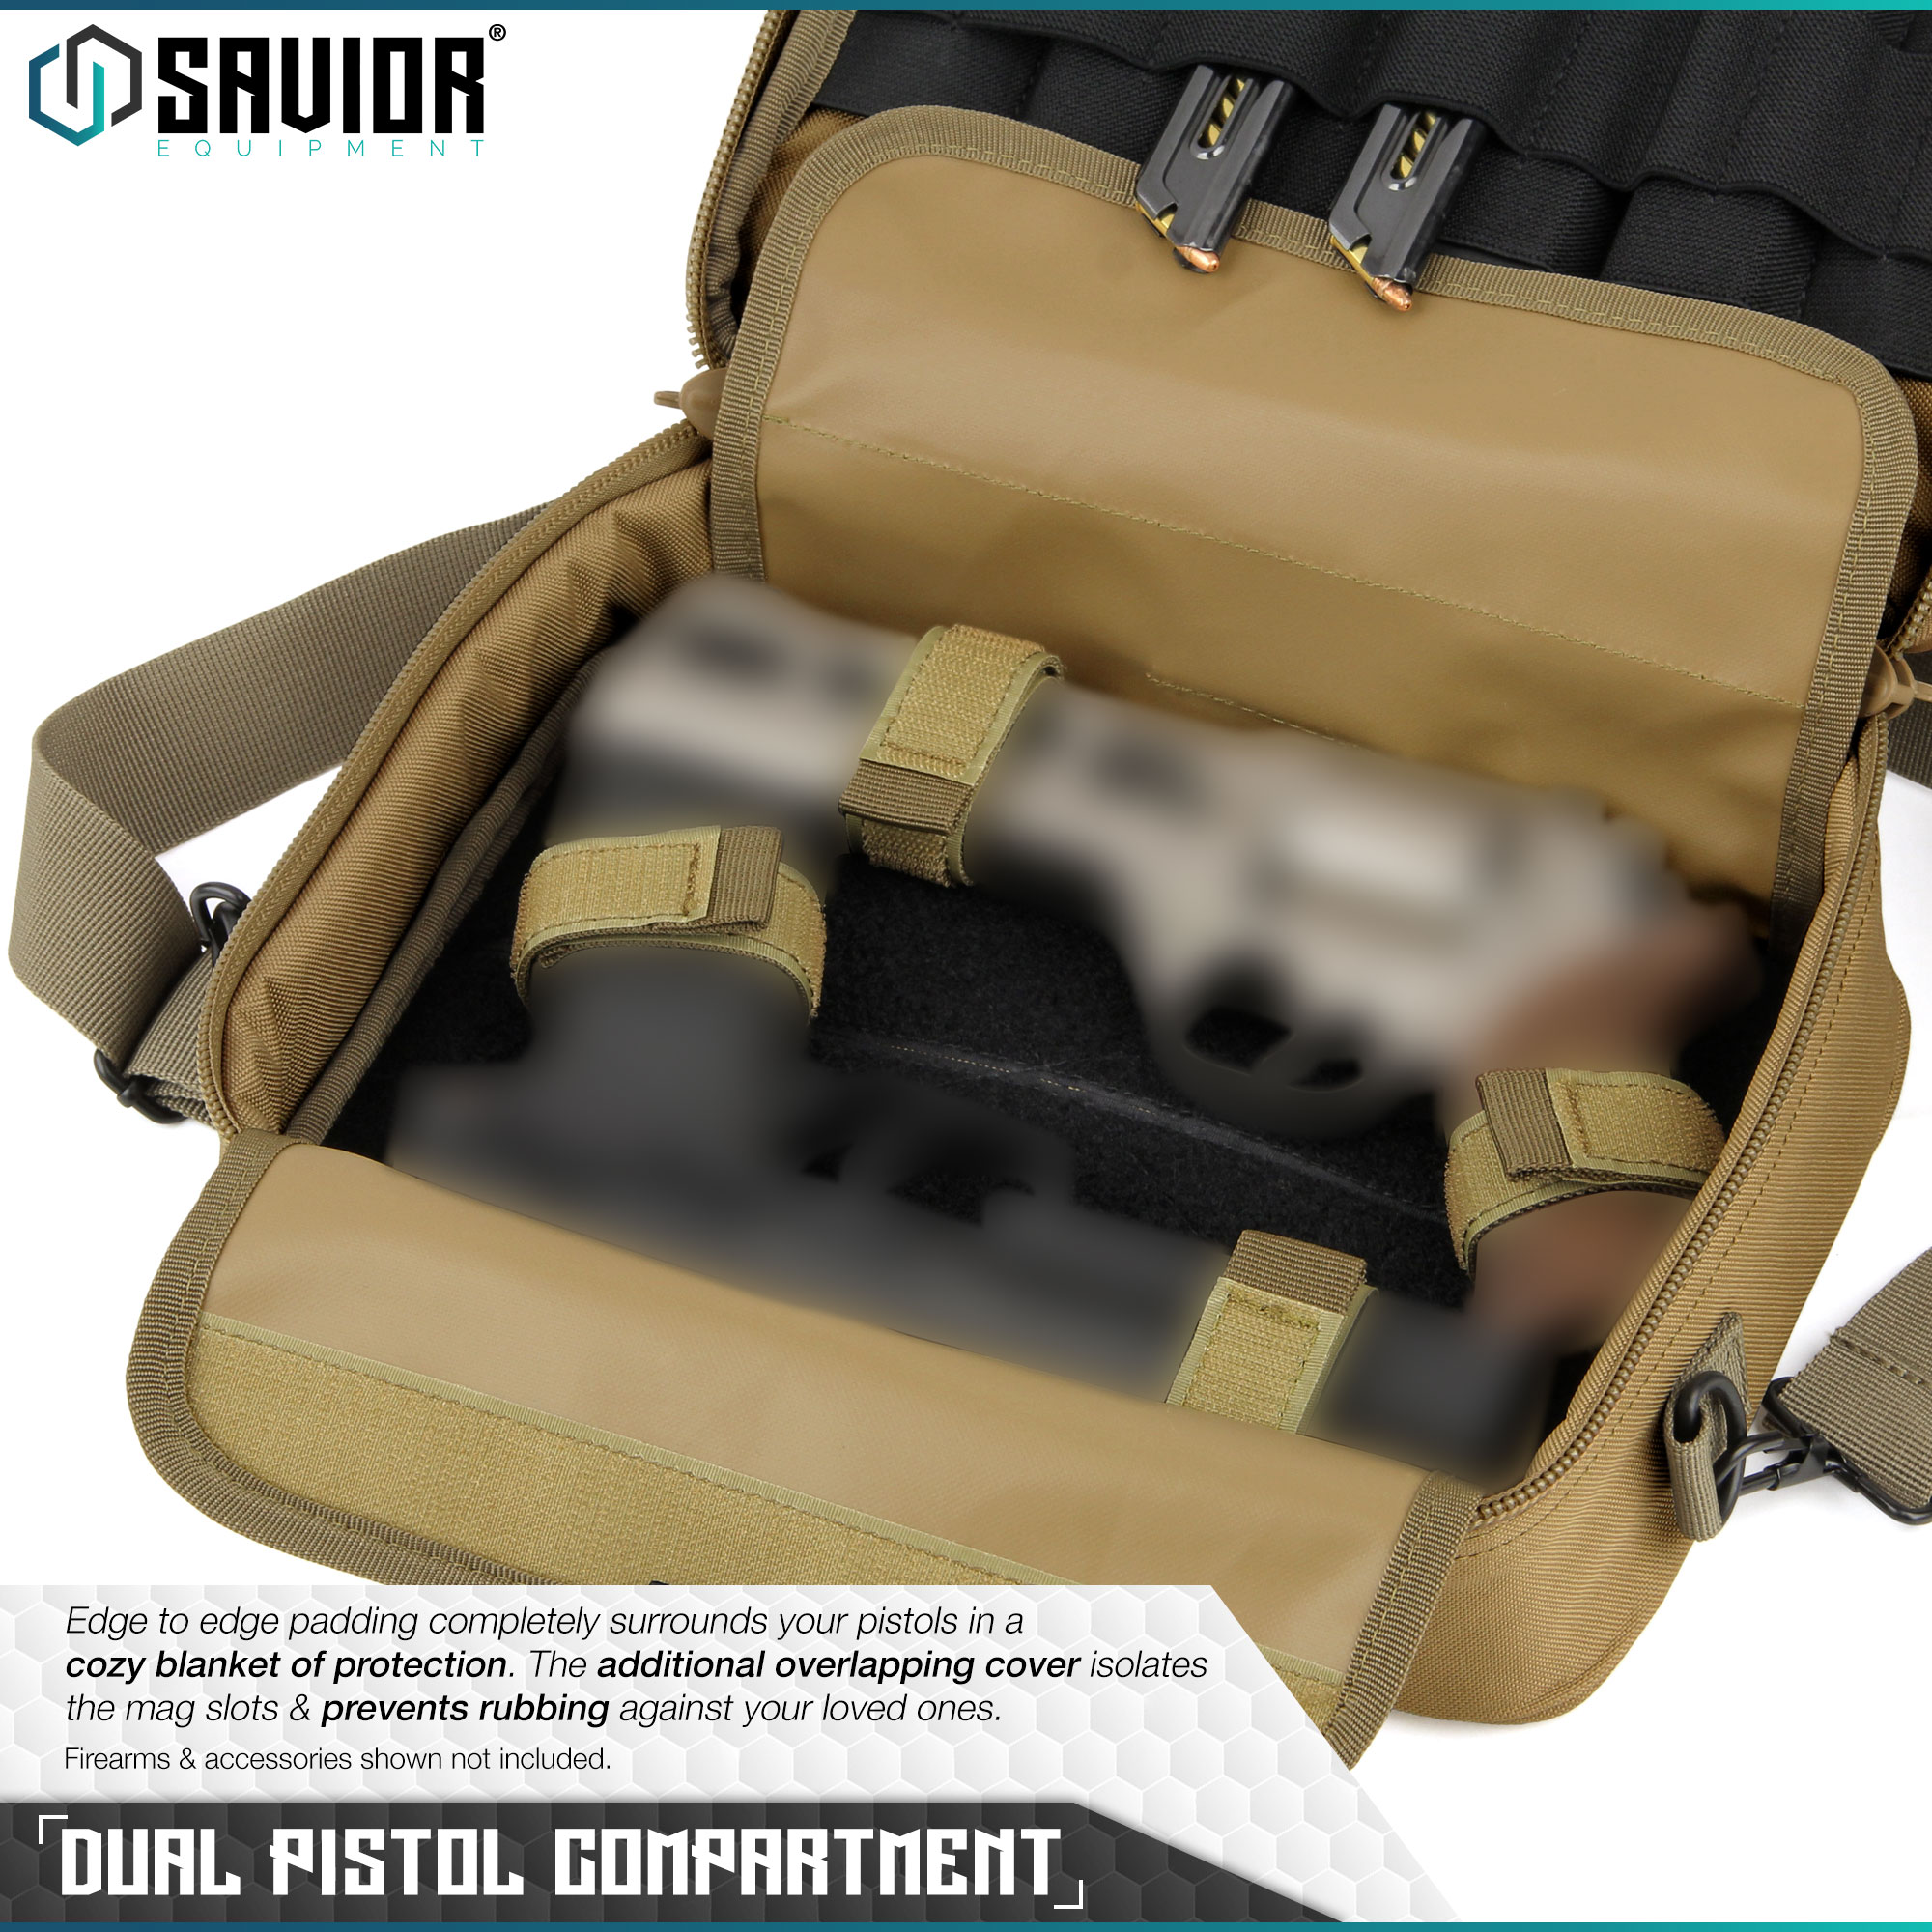 034-SAVIOR-034-Padded-Discreet-Double-Handgun-Bag-Pistol-Storage-Case-w-Mag-Pouch-Slot thumbnail 9